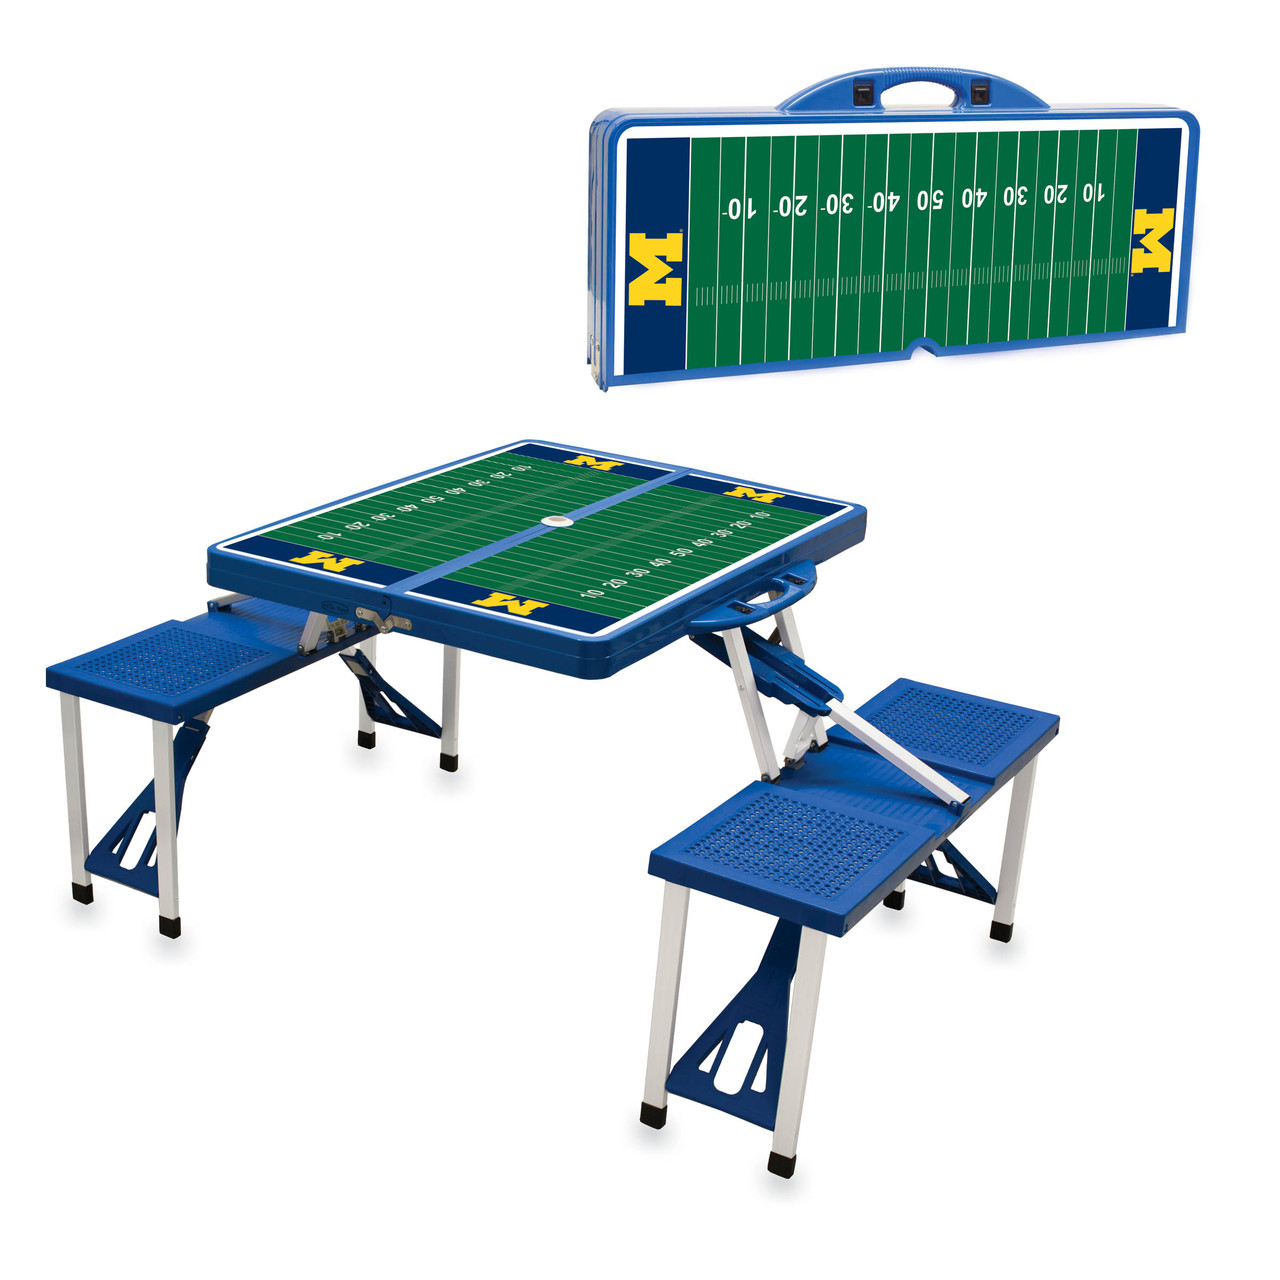 Picnic Table Sport - University of Michigan